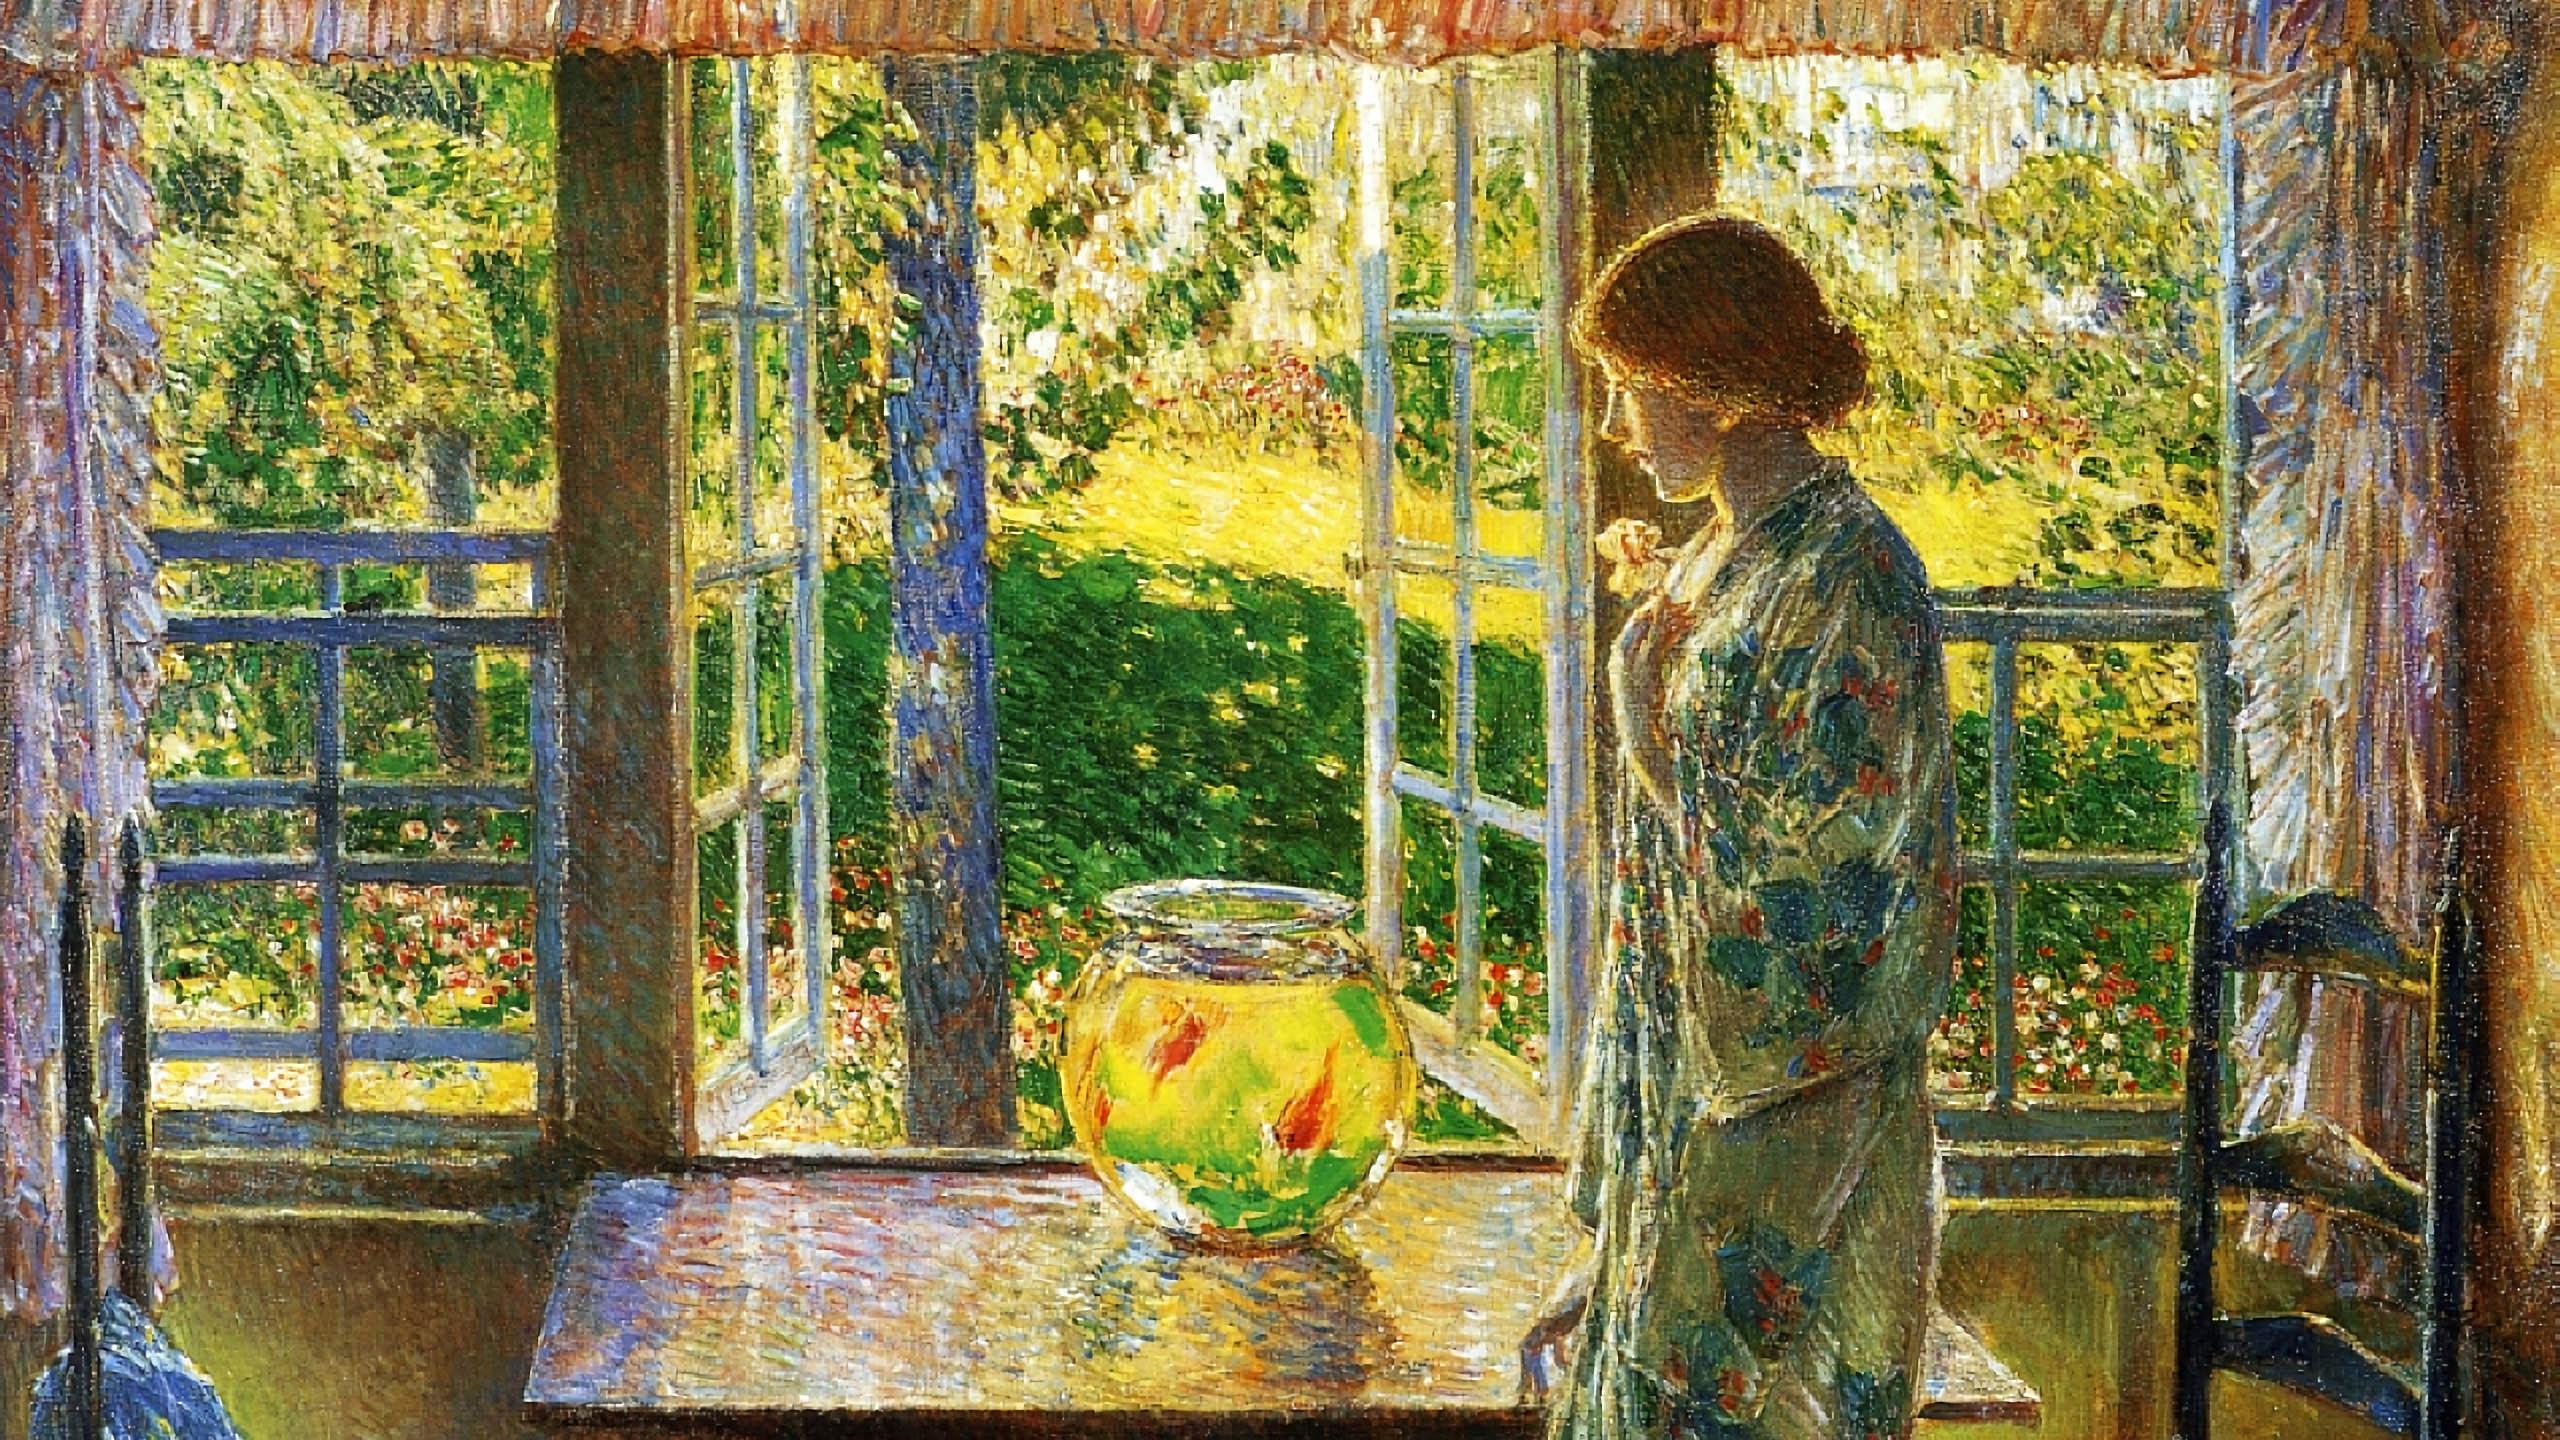 Frederick Childe Hassam - The Goldfish Window 2560x1440